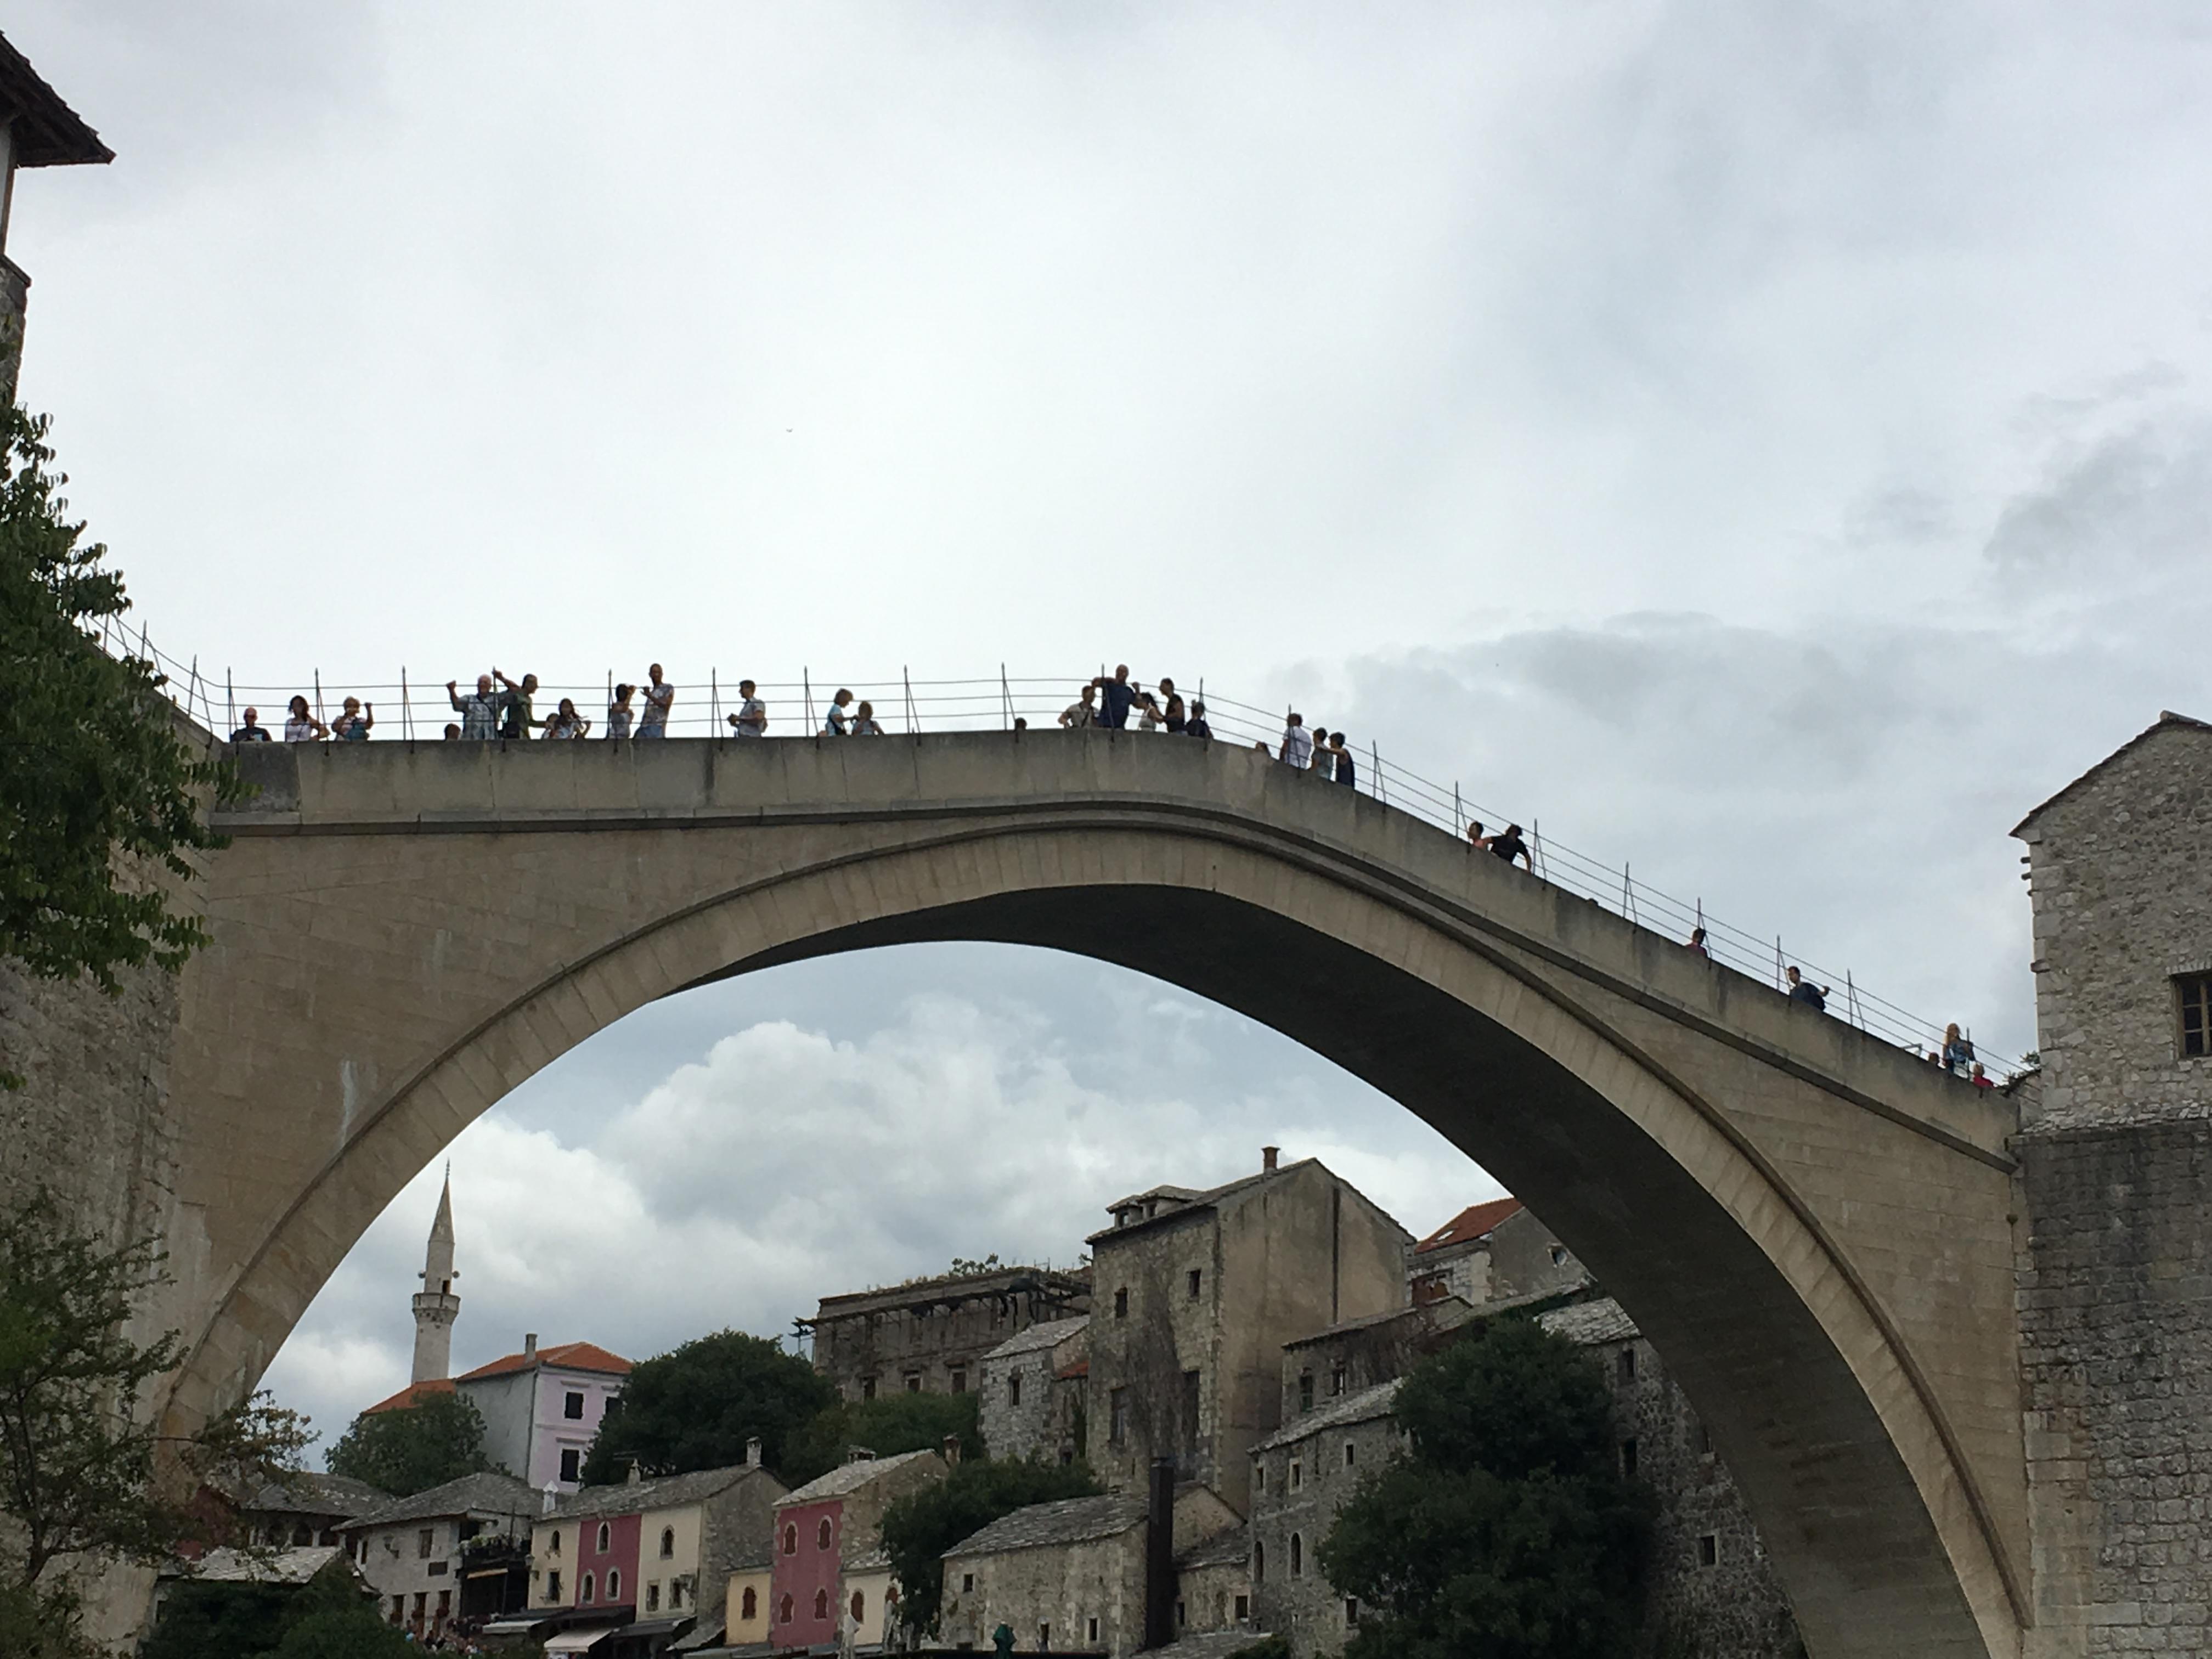 Stari Most - Old Bridge in Mostar